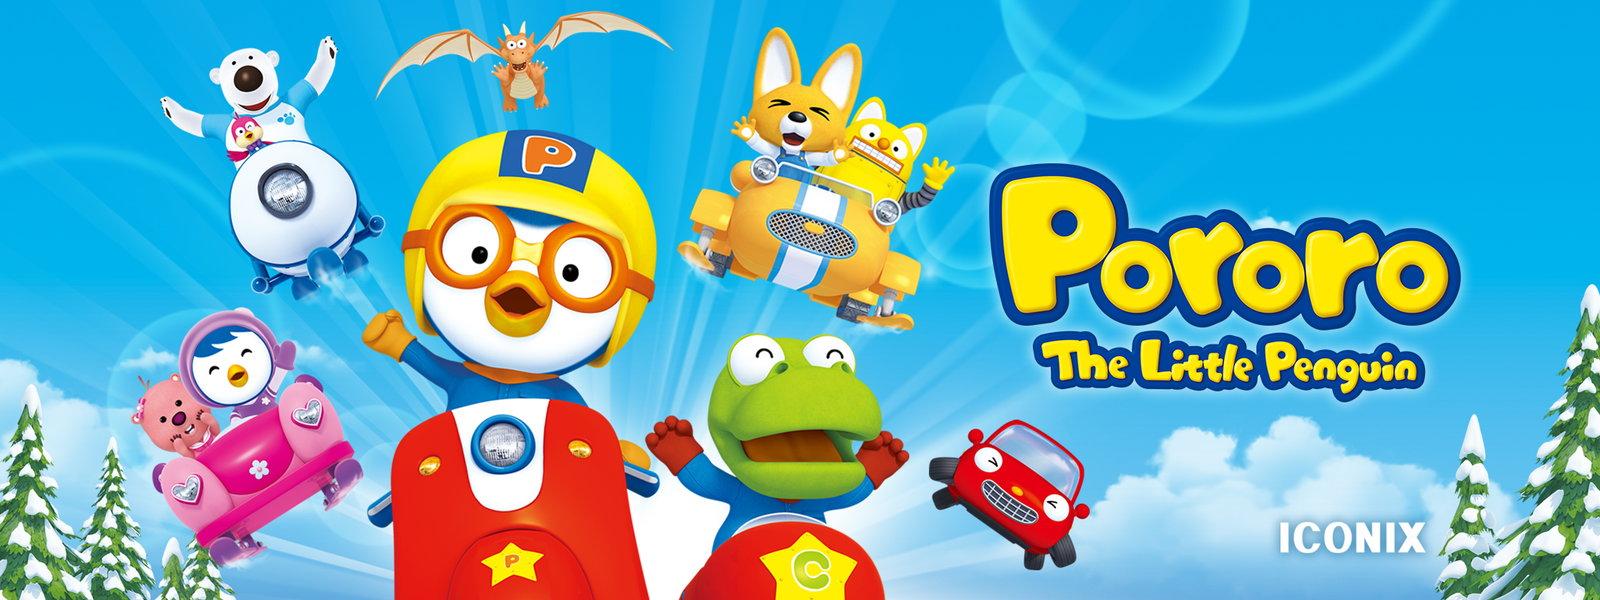 Pororo the little penguin episodes hulu pororo the little penguin episodes altavistaventures Gallery